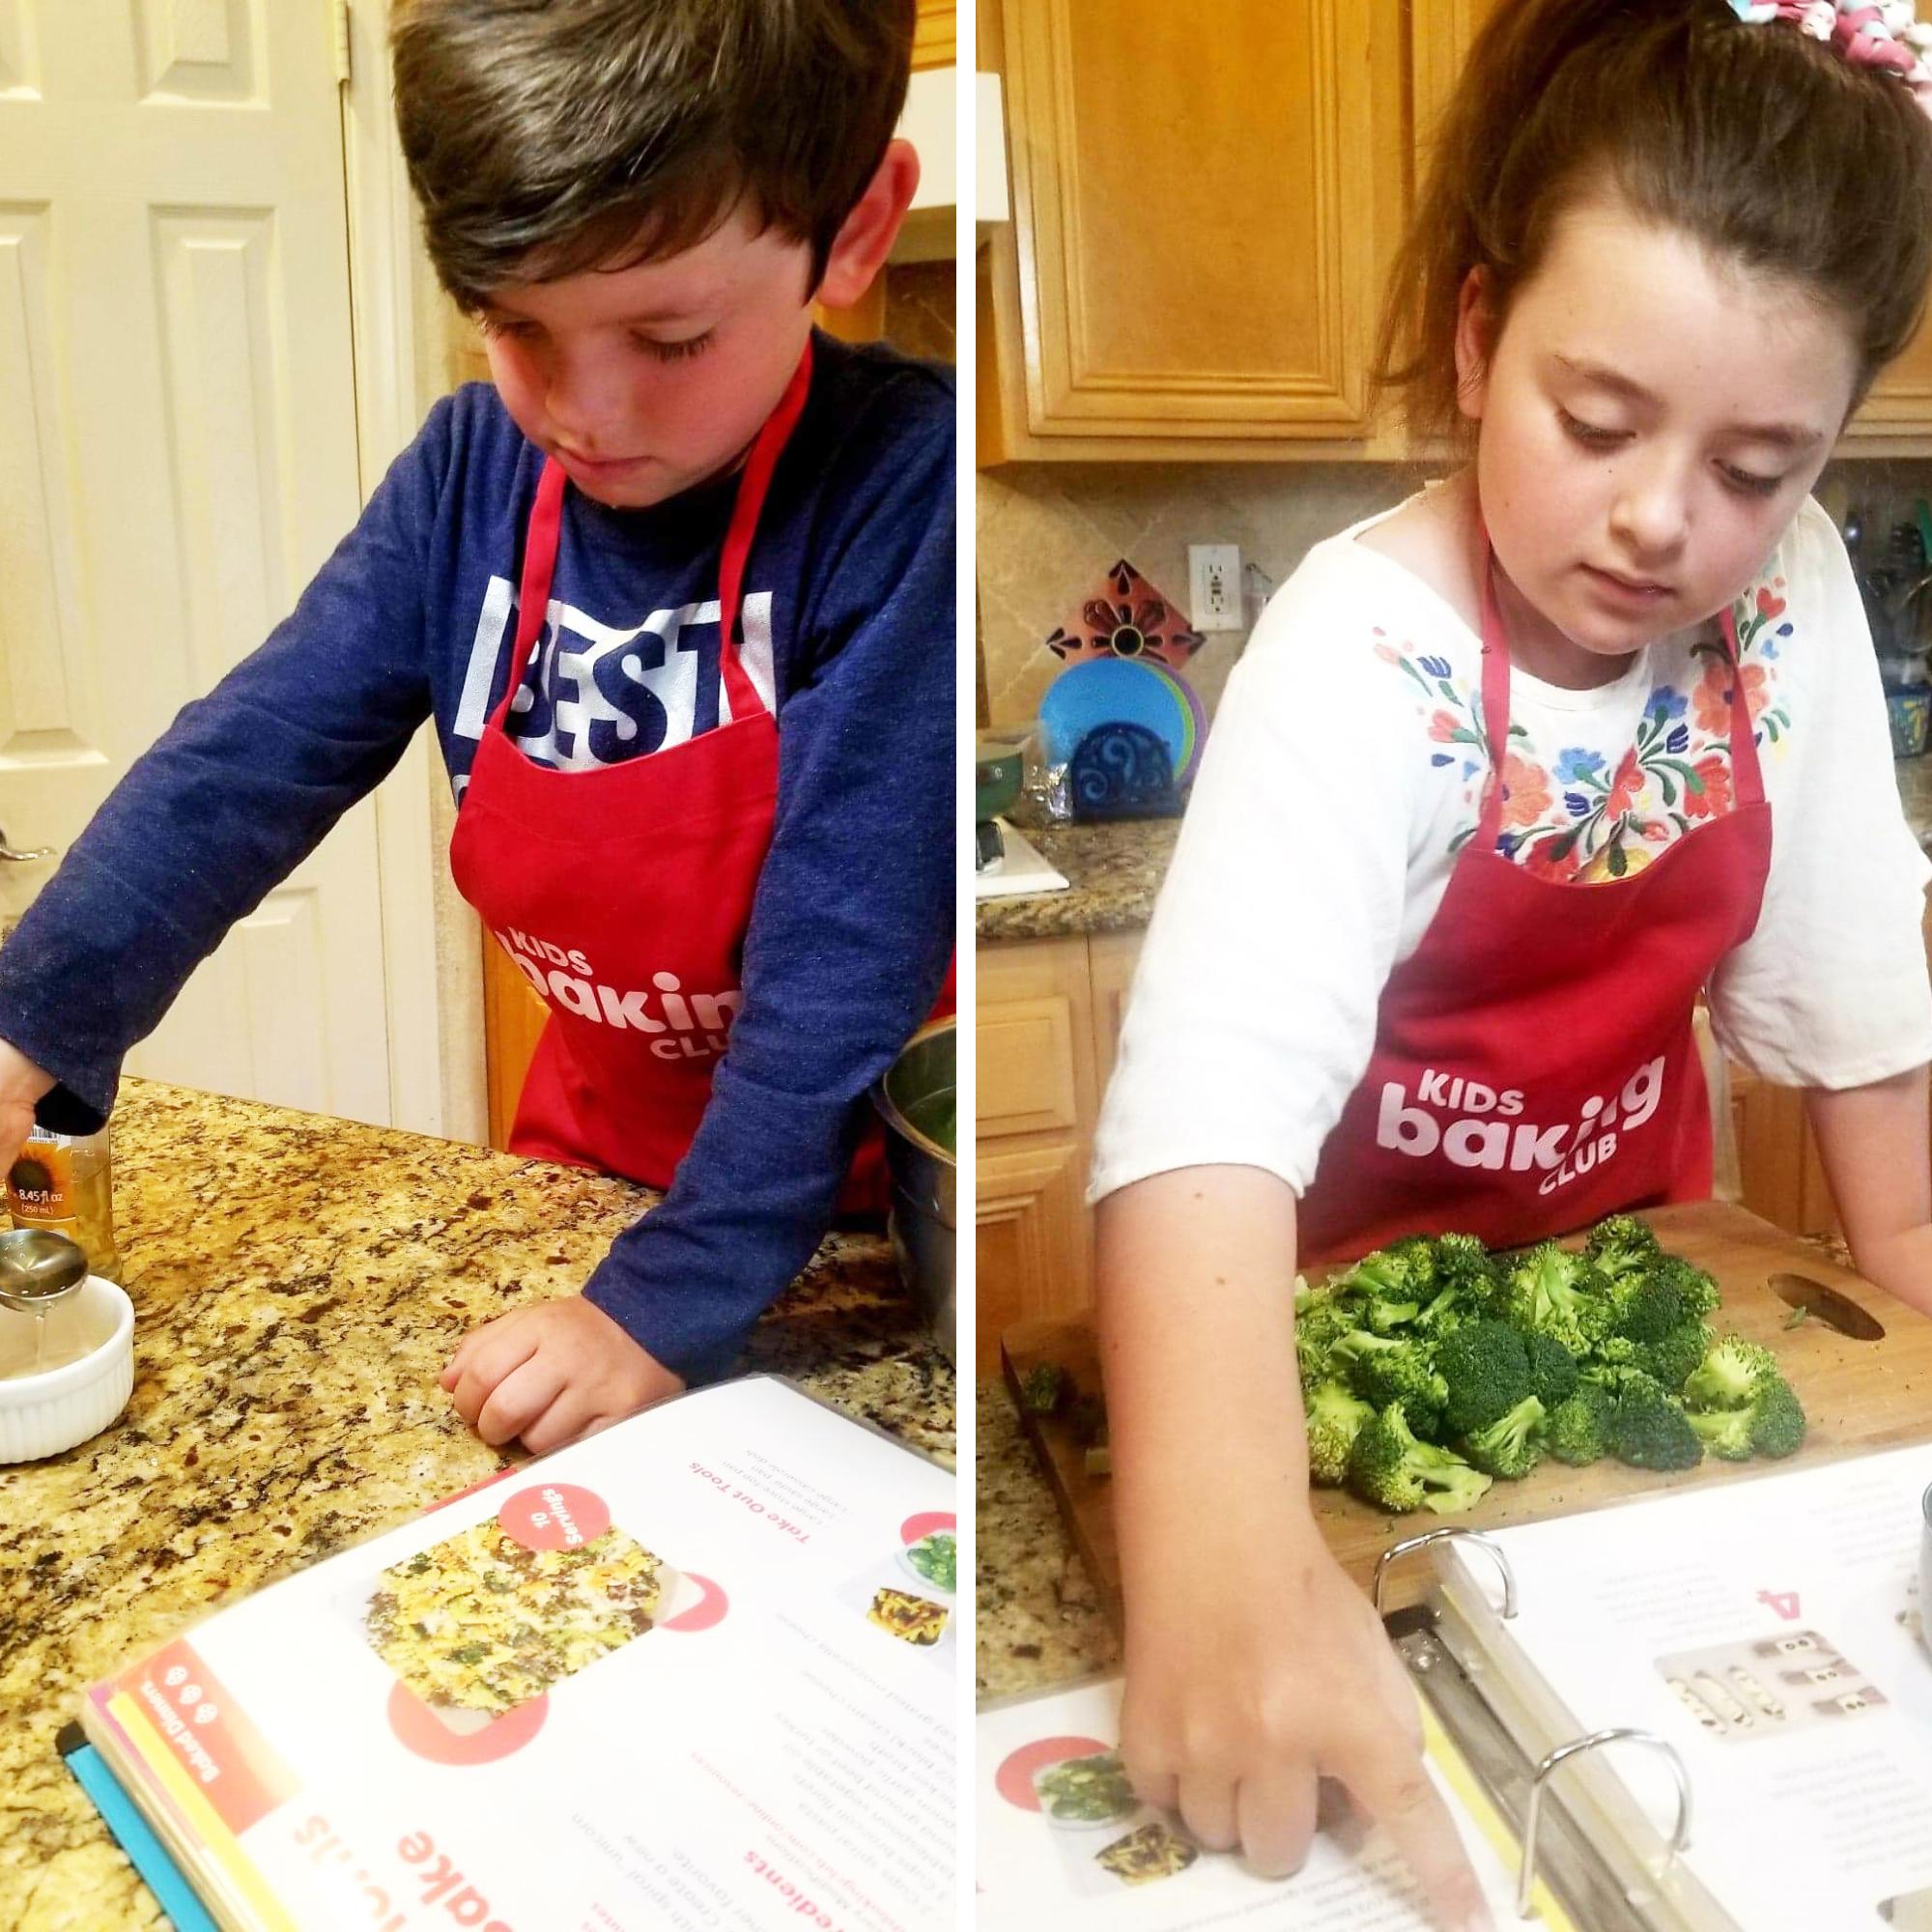 Kids baking club - easy baking recipes for kids